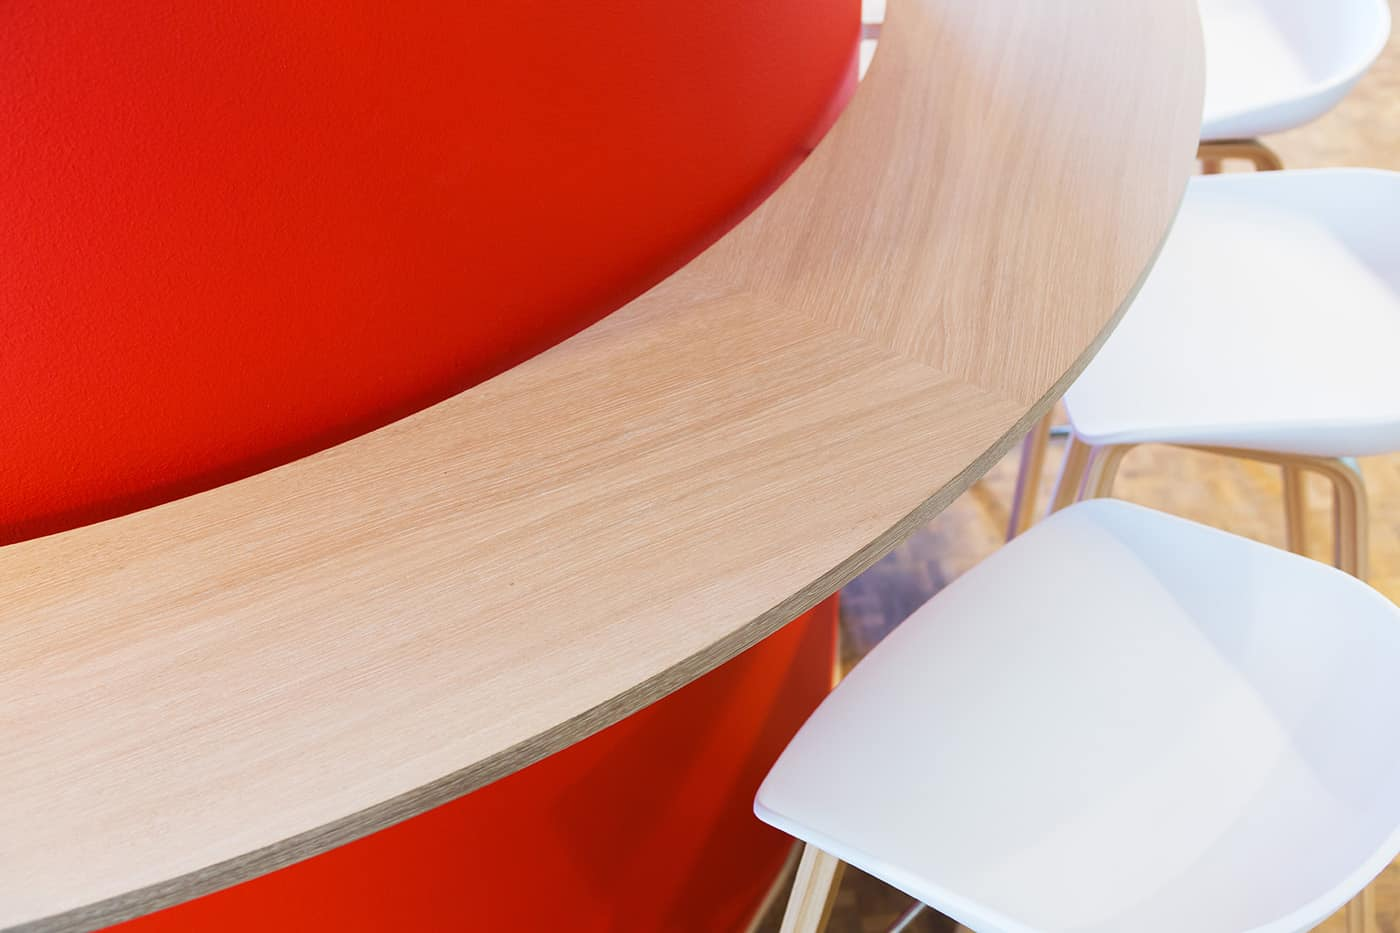 RITAarch, Exerp, indretning, København, Kontorindretning, detalje, specialinventar, specialdesign